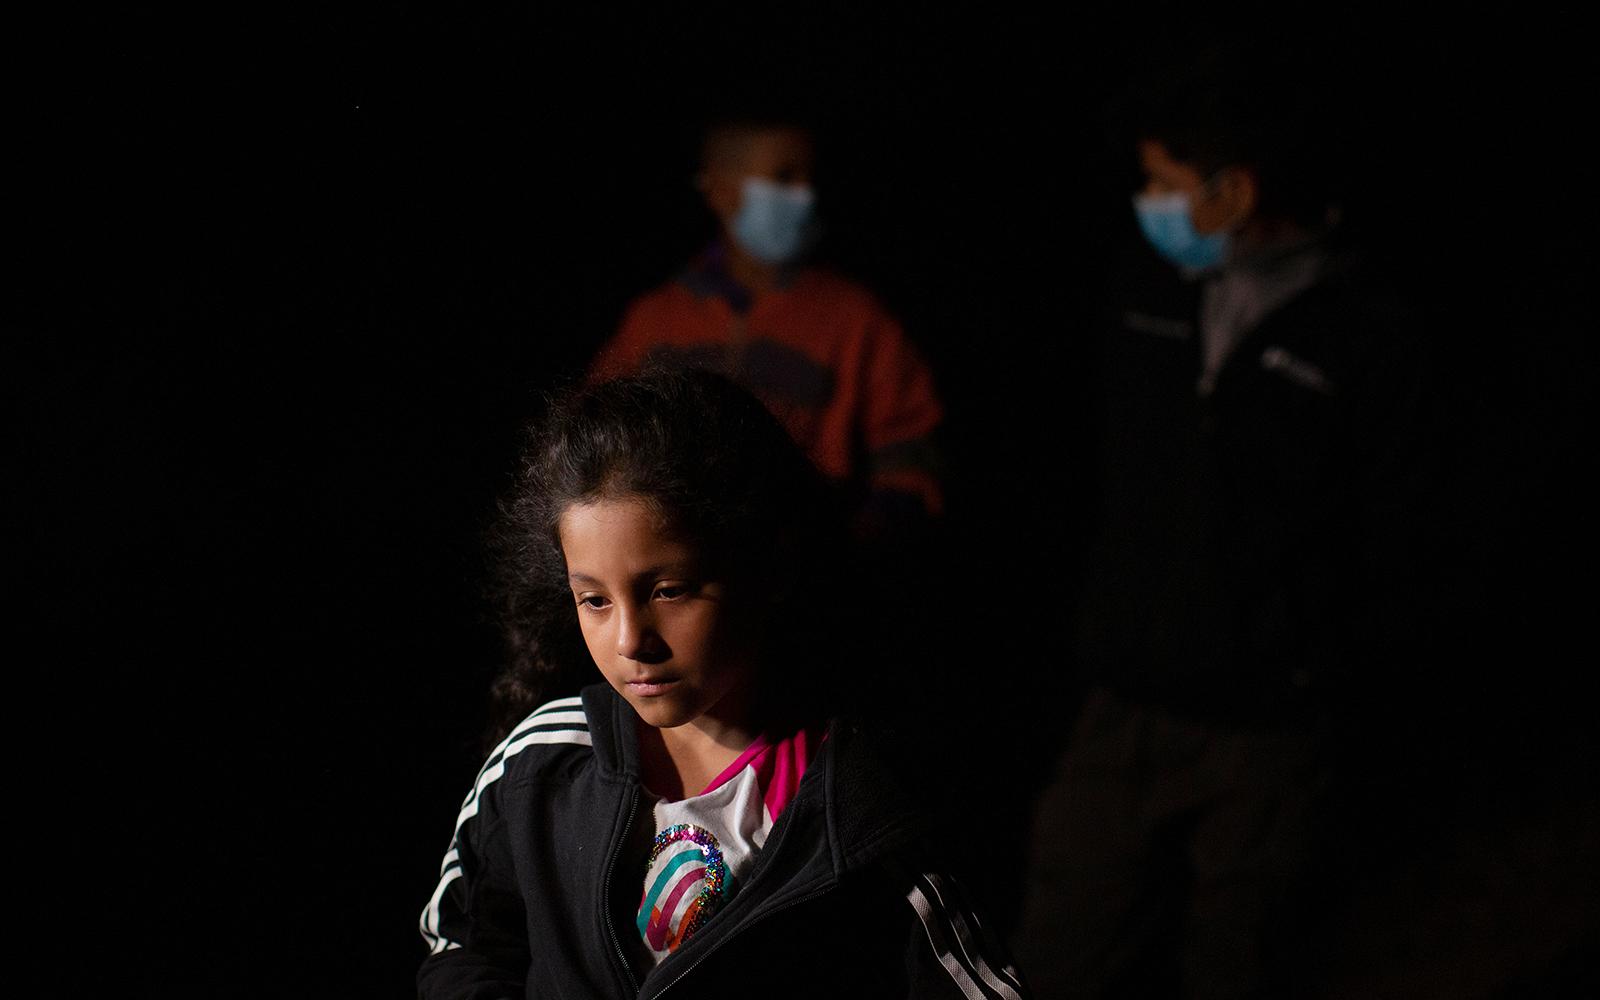 An unaccompanied minor who crossed the US border near Roma Texas